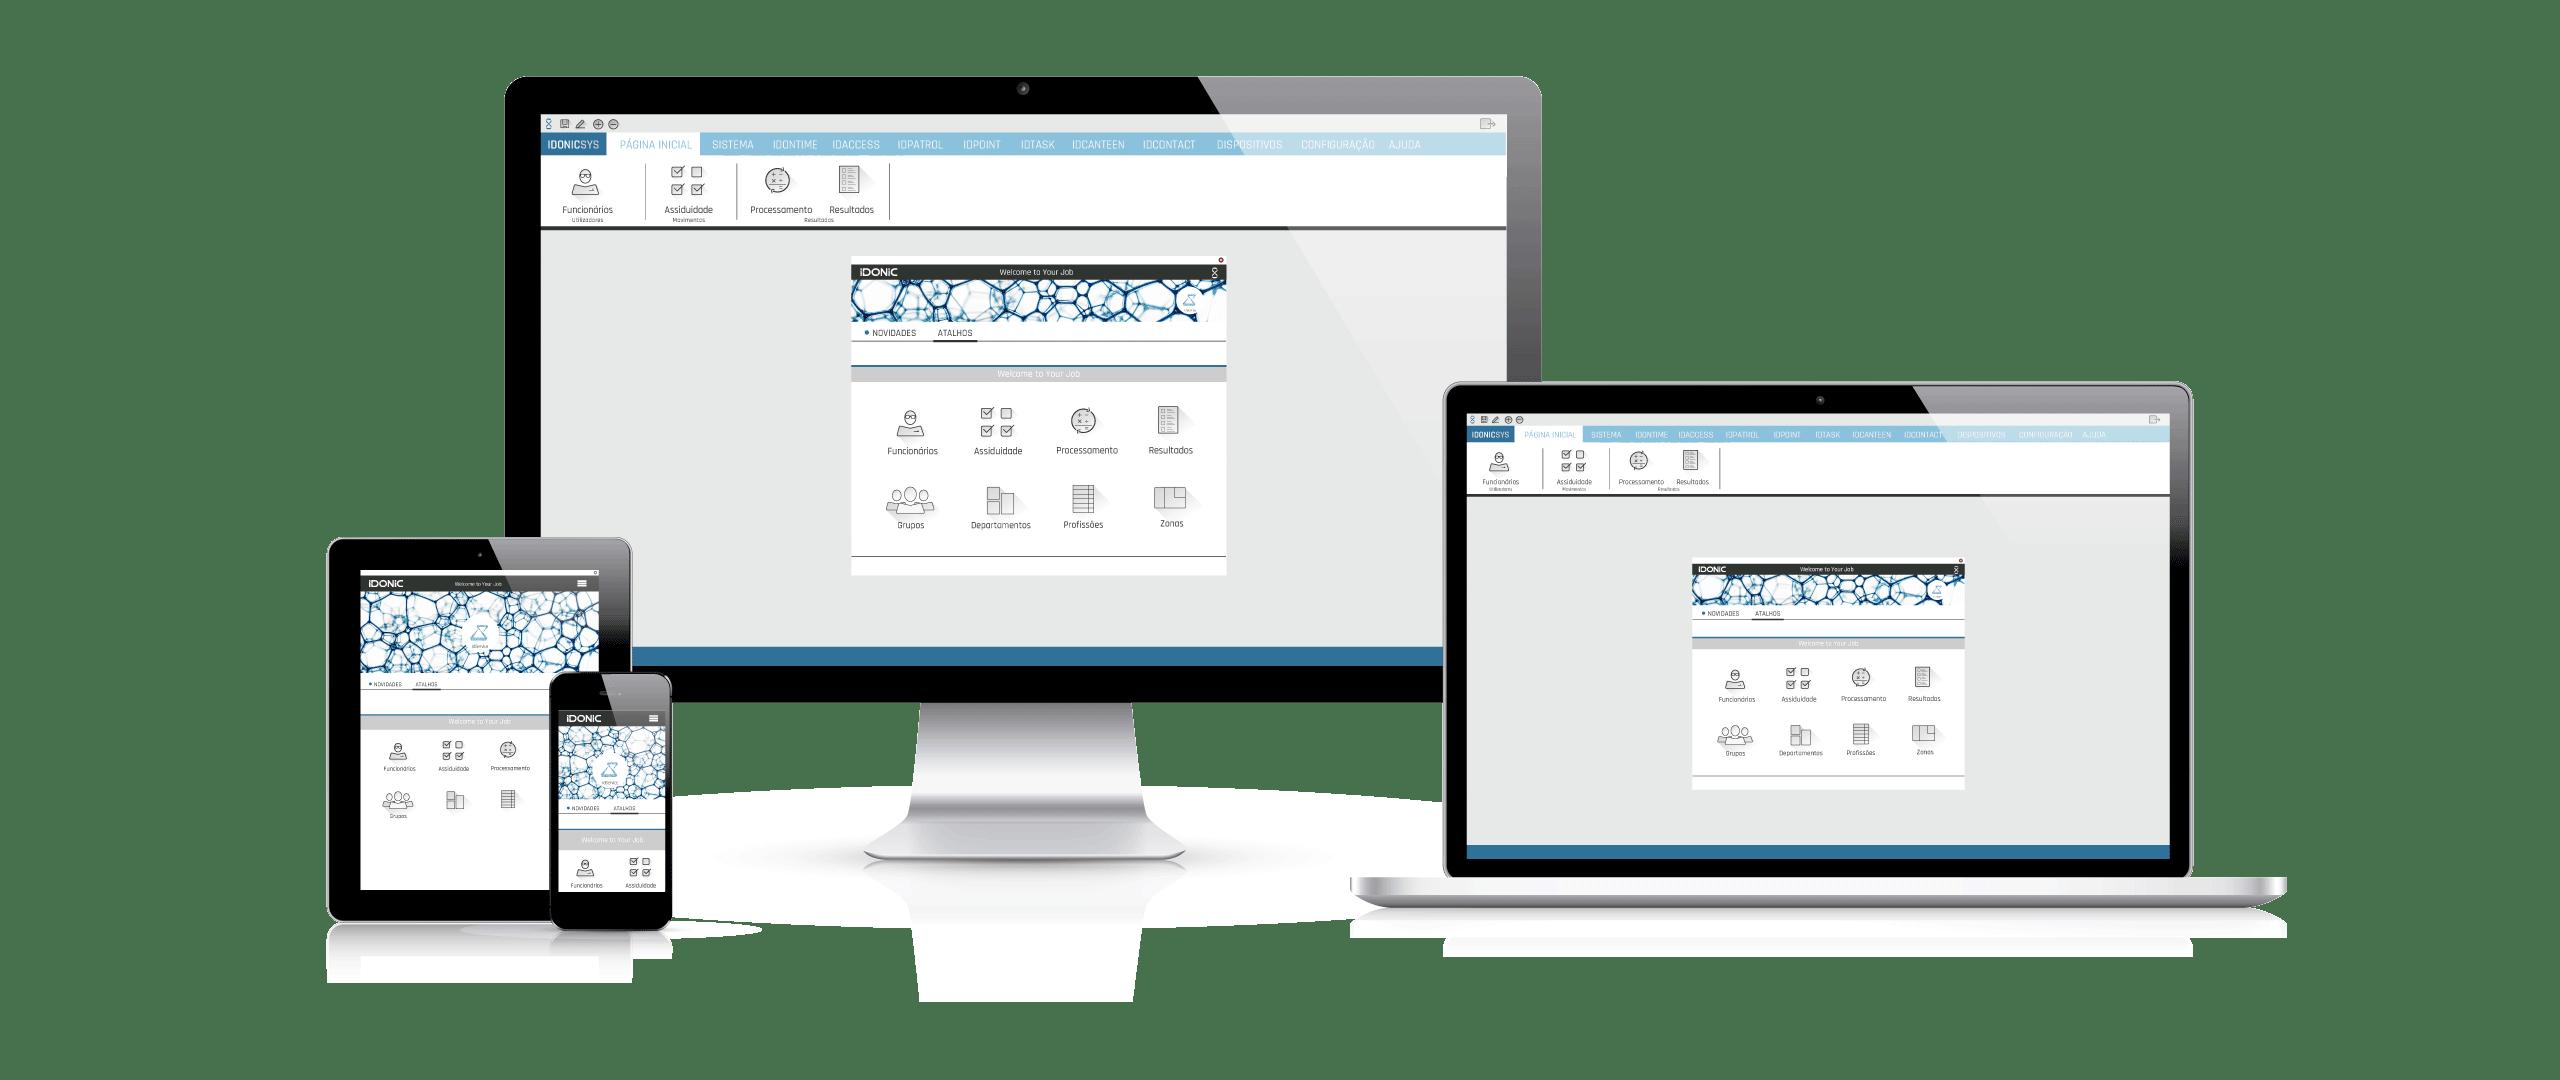 softwareWebidpatrol, Controlo de Rondas de vigilantes